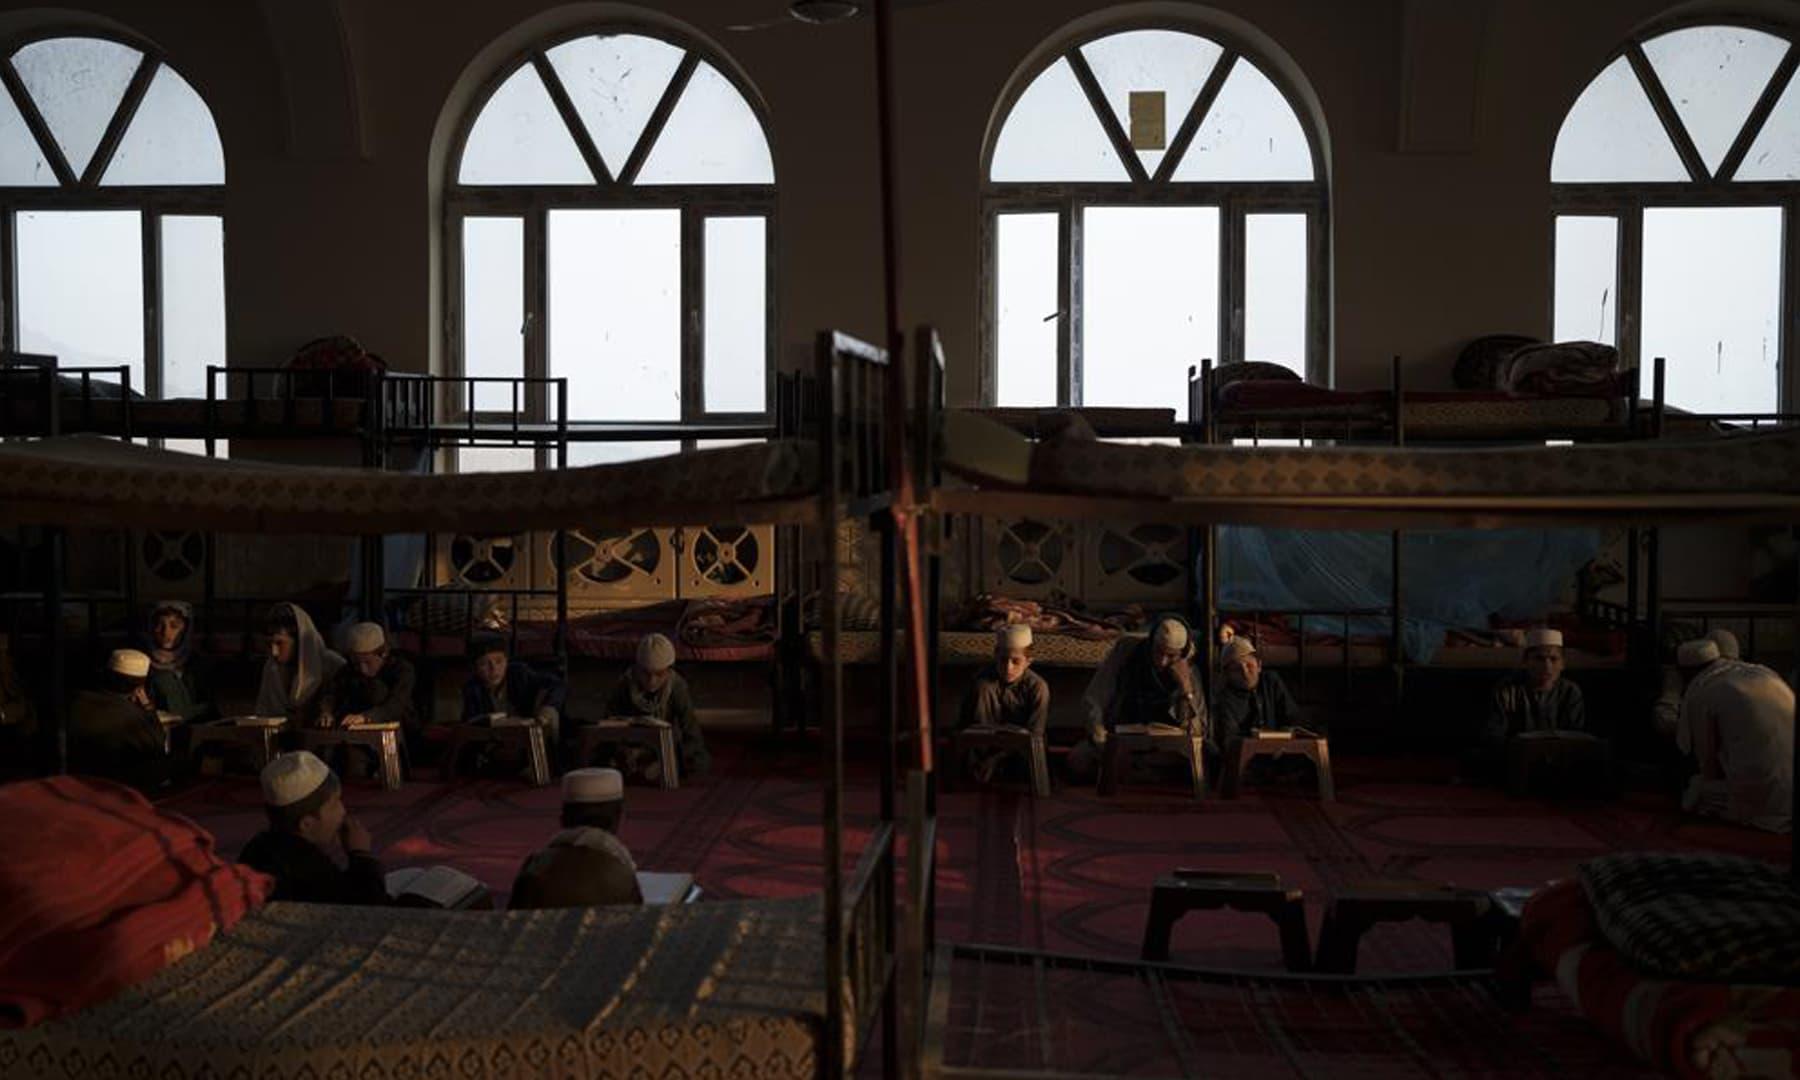 Afghan boys read the Holy Quran during class at the Khatamul Anbiya madressah in Kabul, Afghanistan. — AP